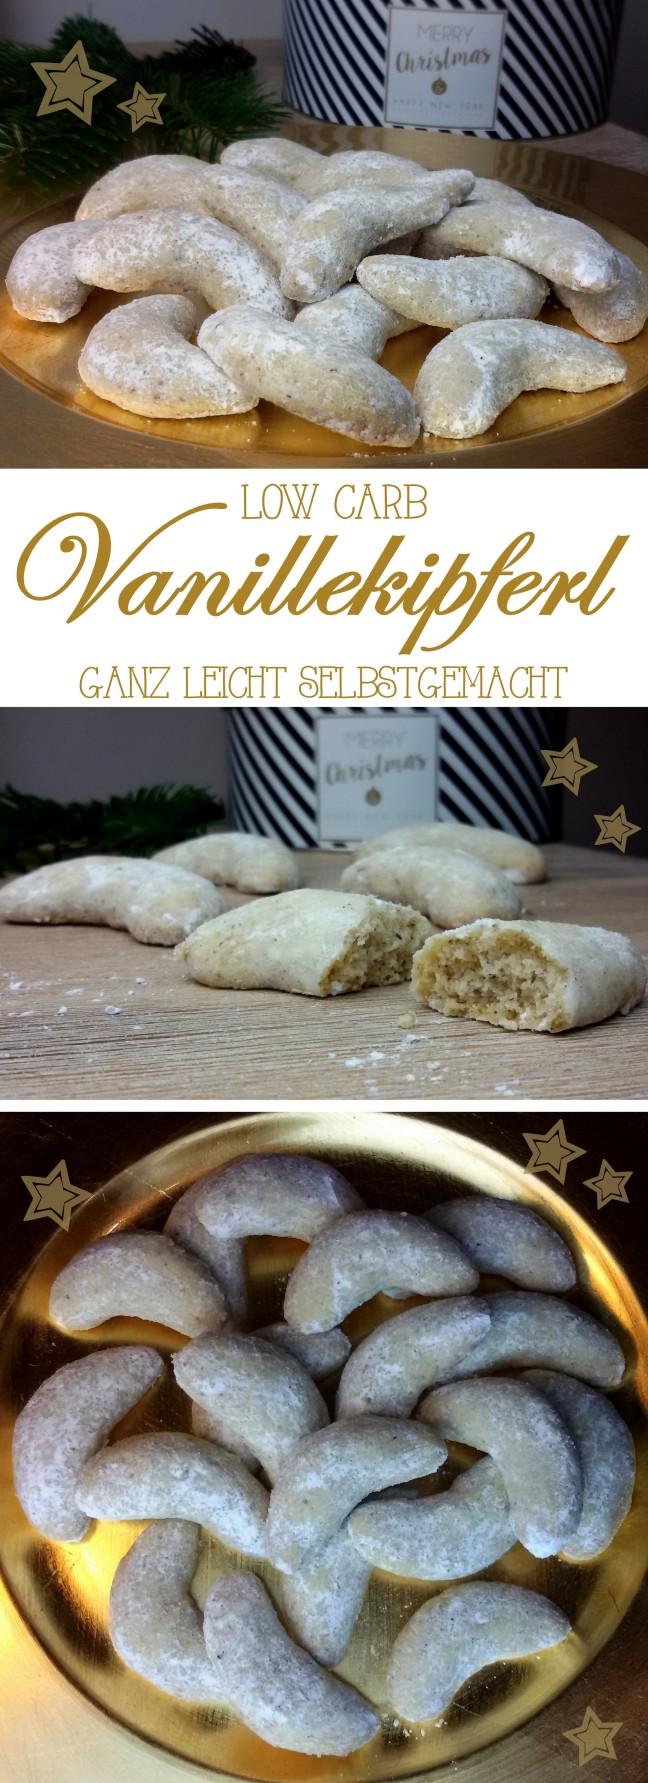 vanillekipferl-low-carb1